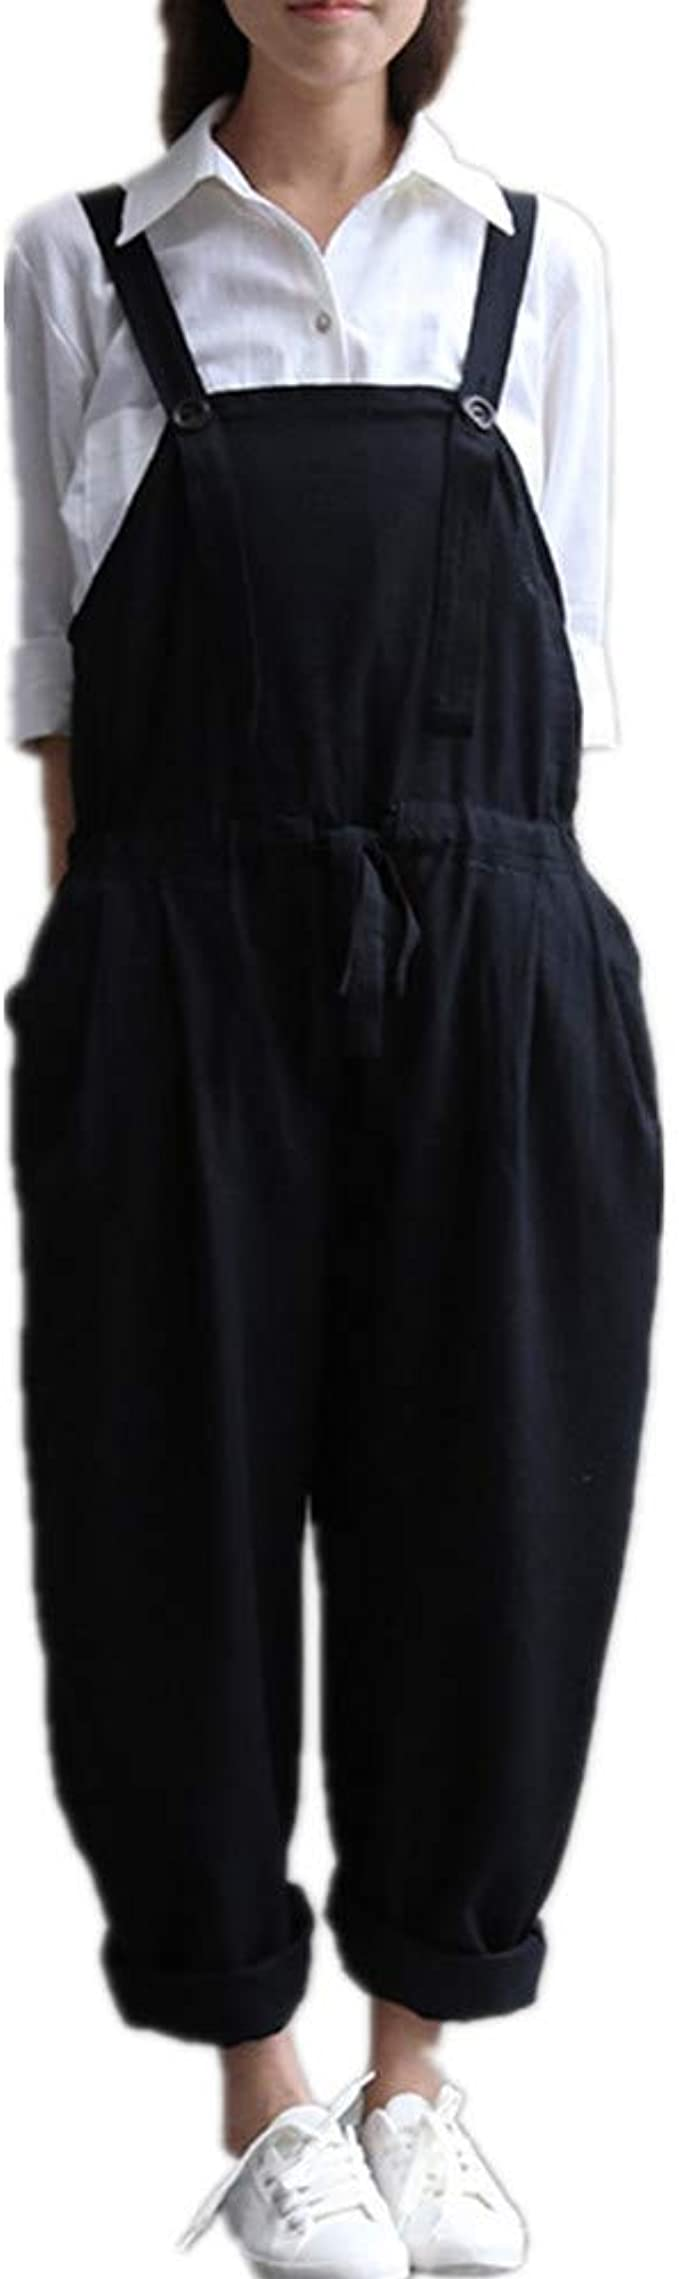 Onsoyours Petos de Pantalones Largo Casual para Mujer Verano Baggy Harem Mono Suelto Moda Bolsillos Overoles Jumpsuit Tirantes Color S/ólido Pantal/ón